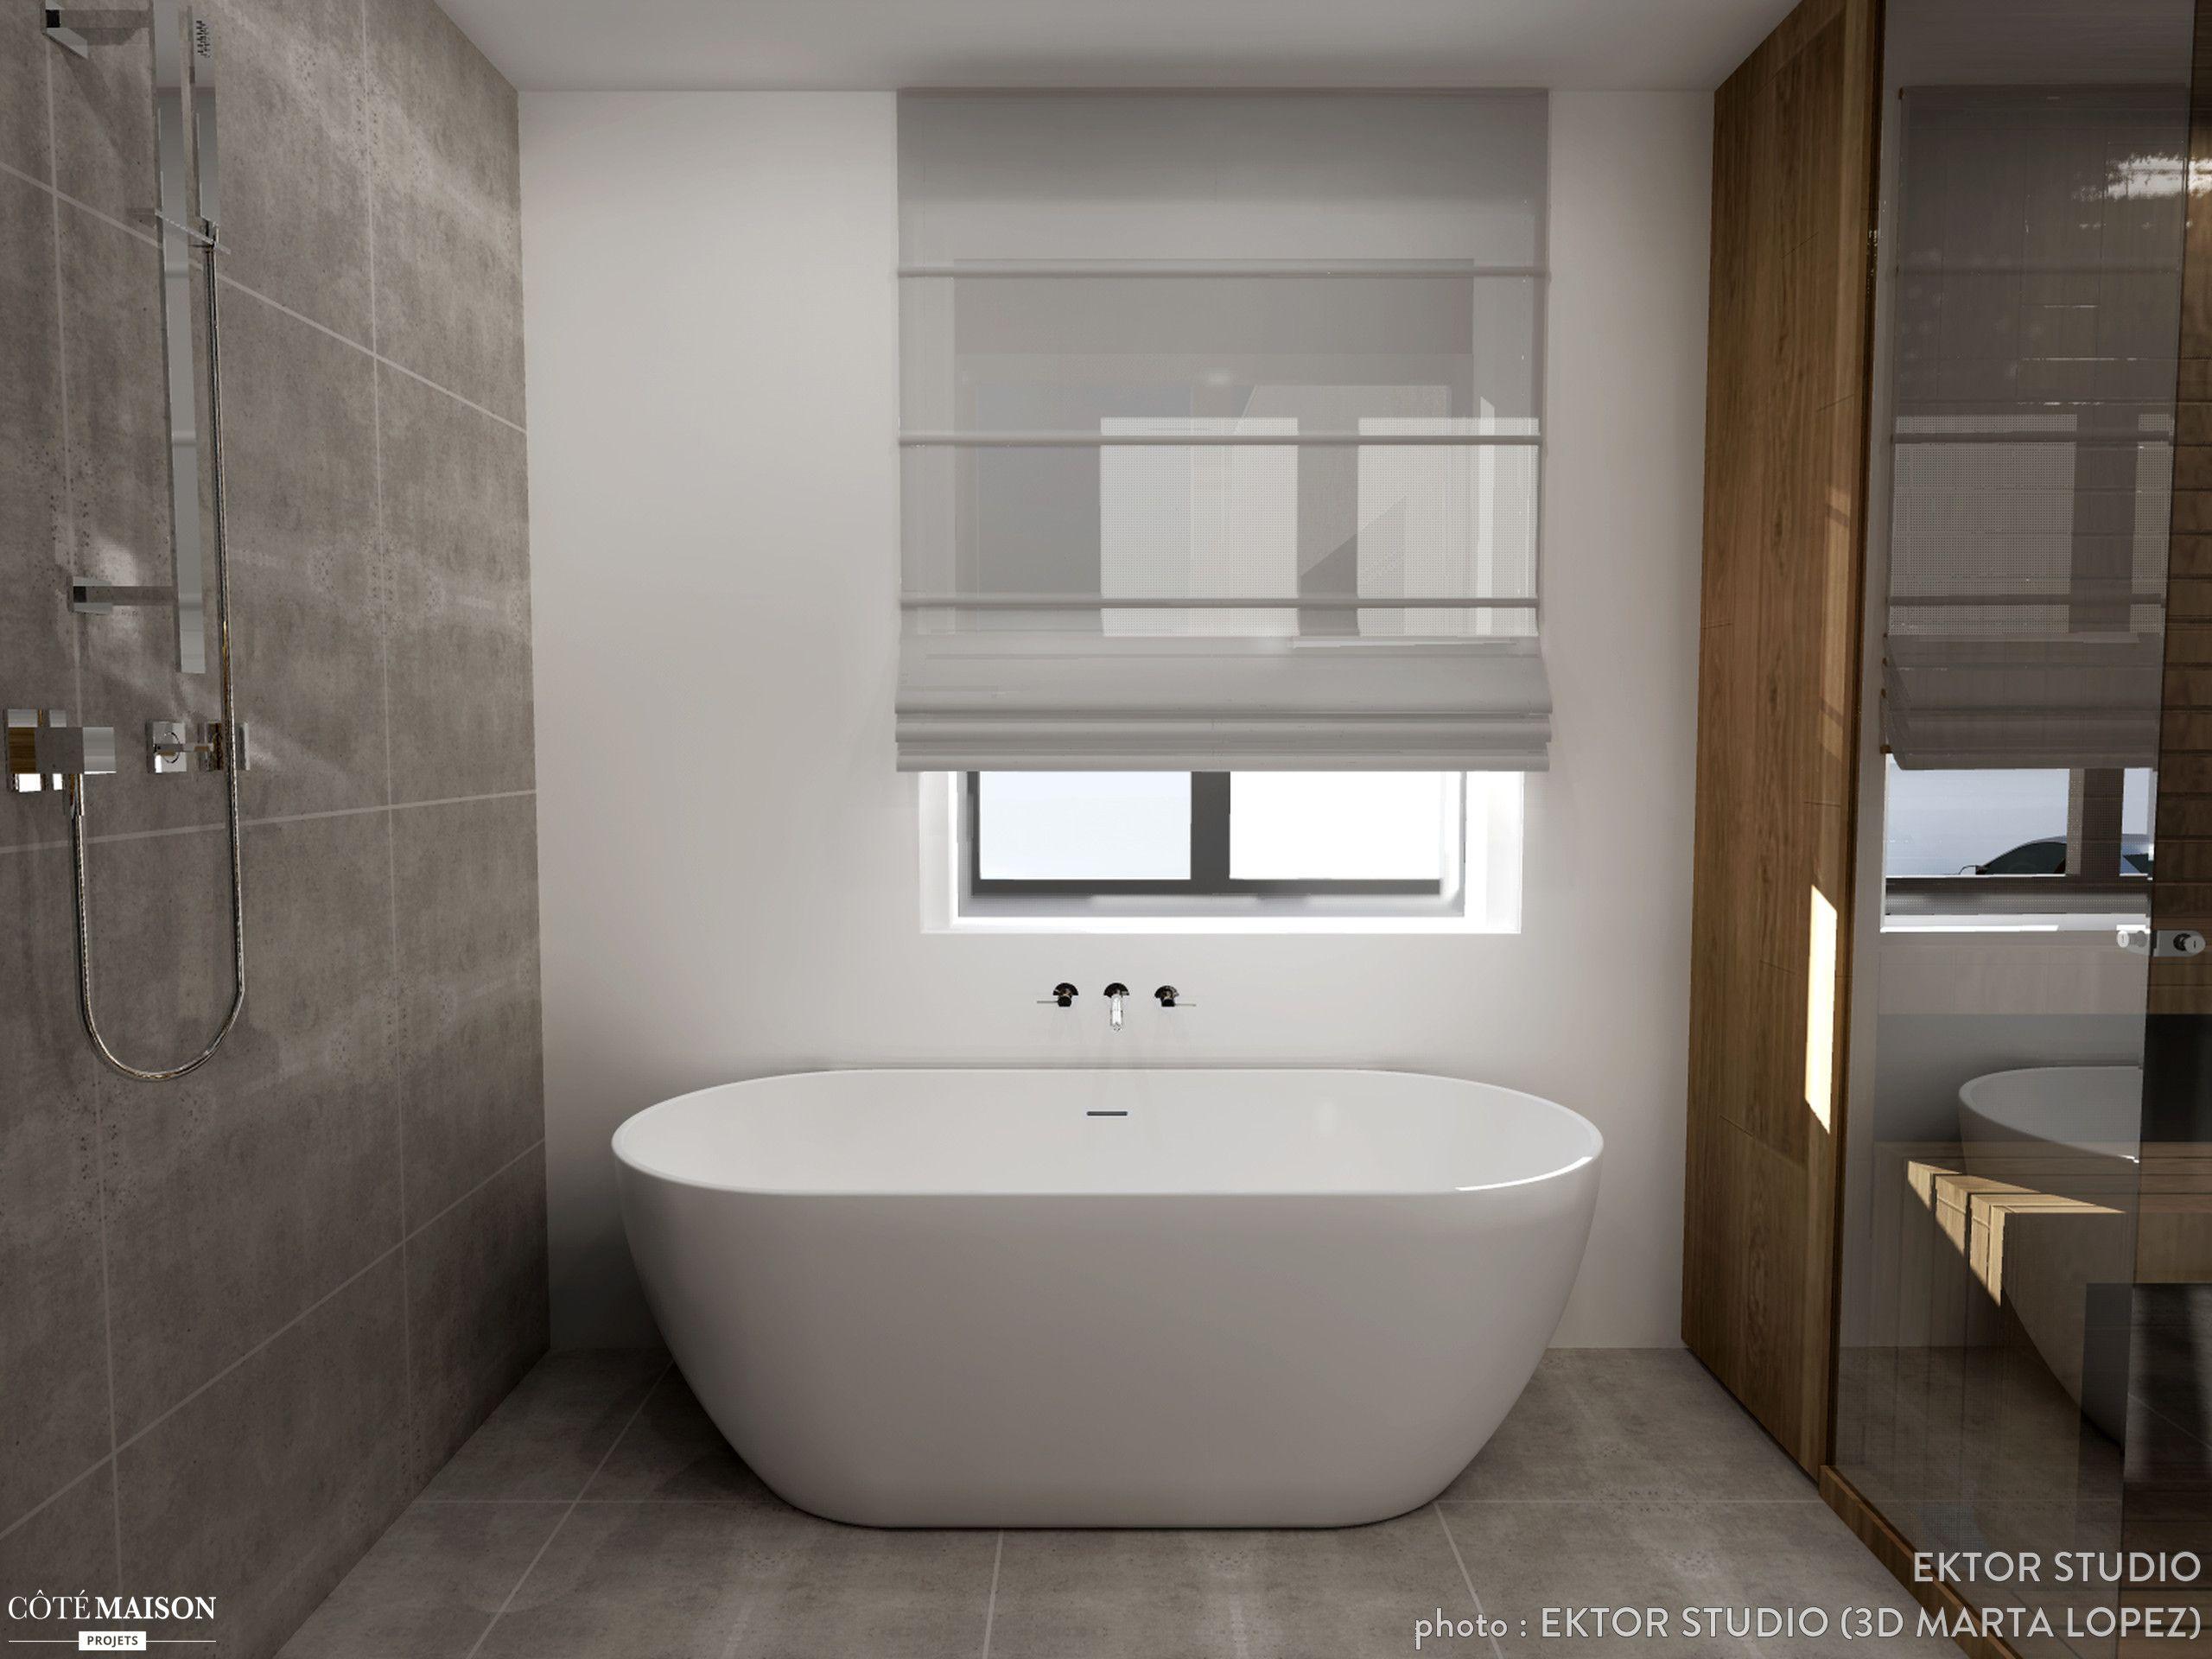 R alisation d 39 une salle de bains strasbourg ektor studio c t maison bathroom bathroom - Salle de bain strasbourg ...